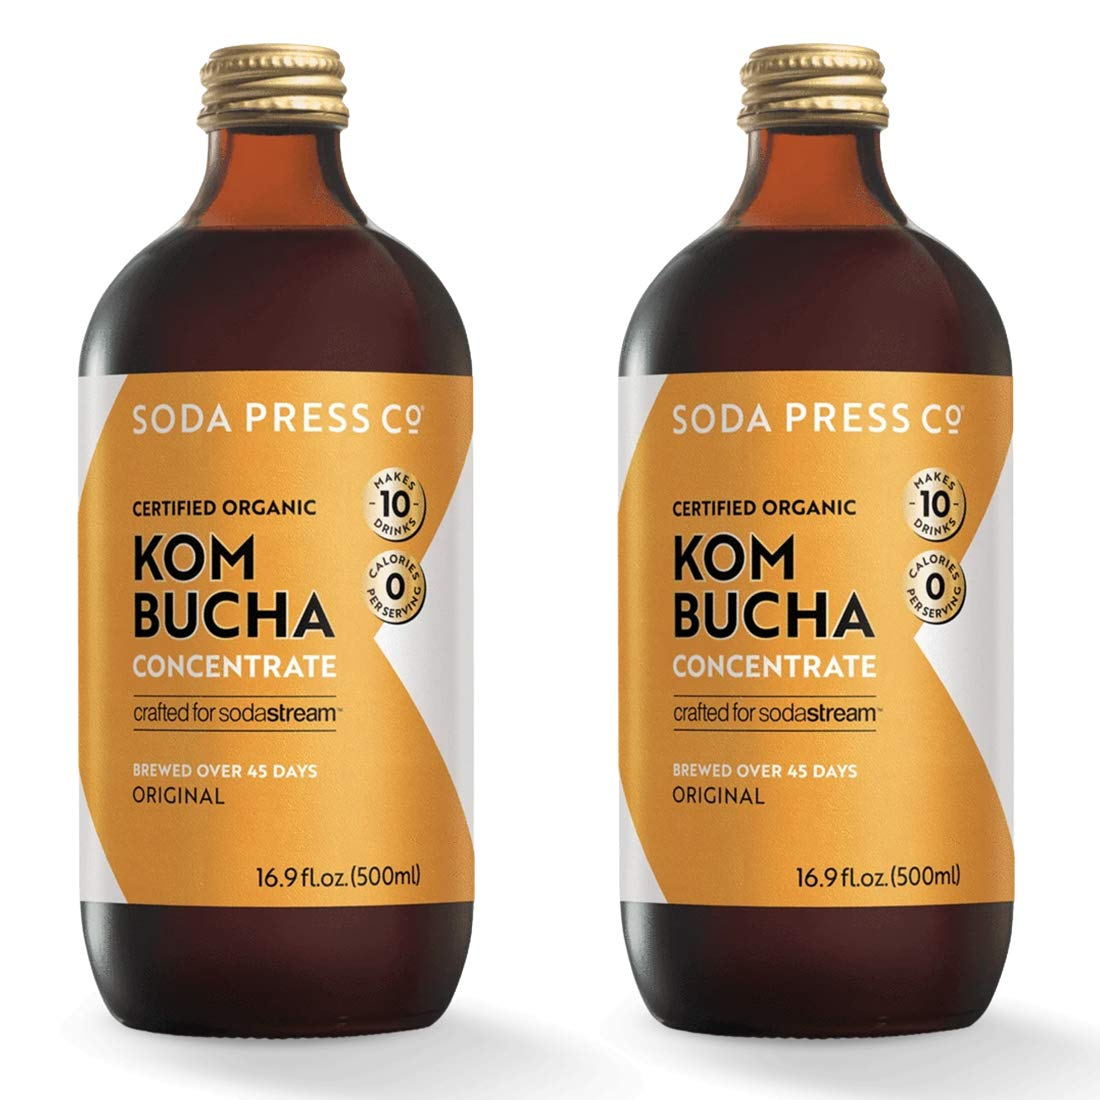 Soda Press Organic Kombucha Flavor Mix for SodaStream, 16.9 Fl Oz, 2 Pk